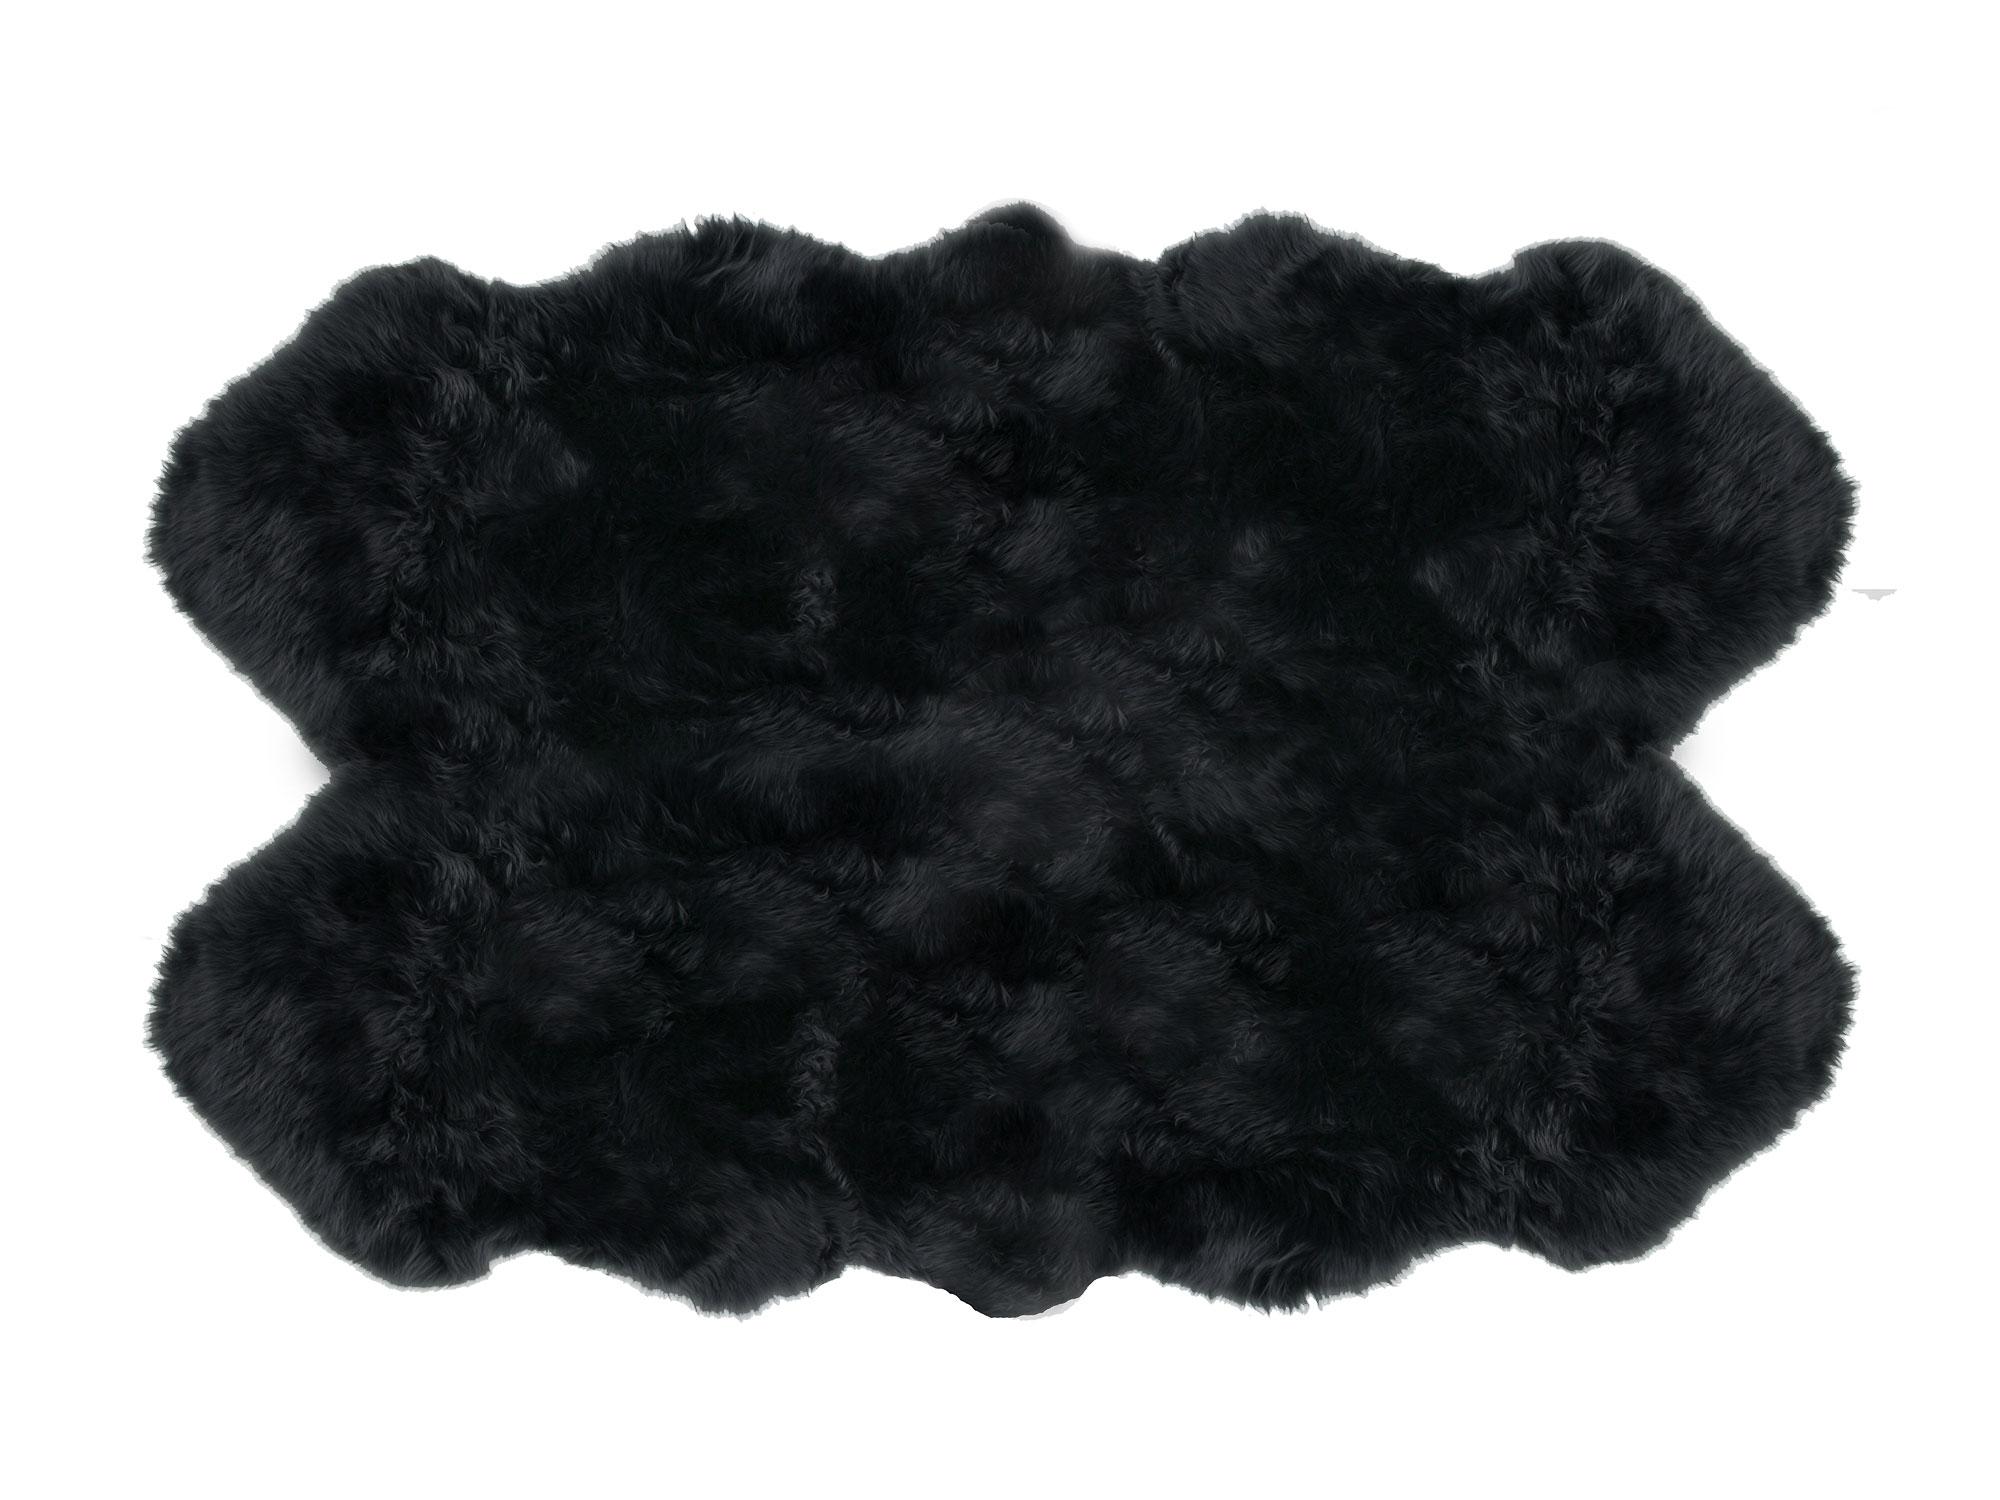 Sheepskin 4 Pelt Large Fur Rugs Black